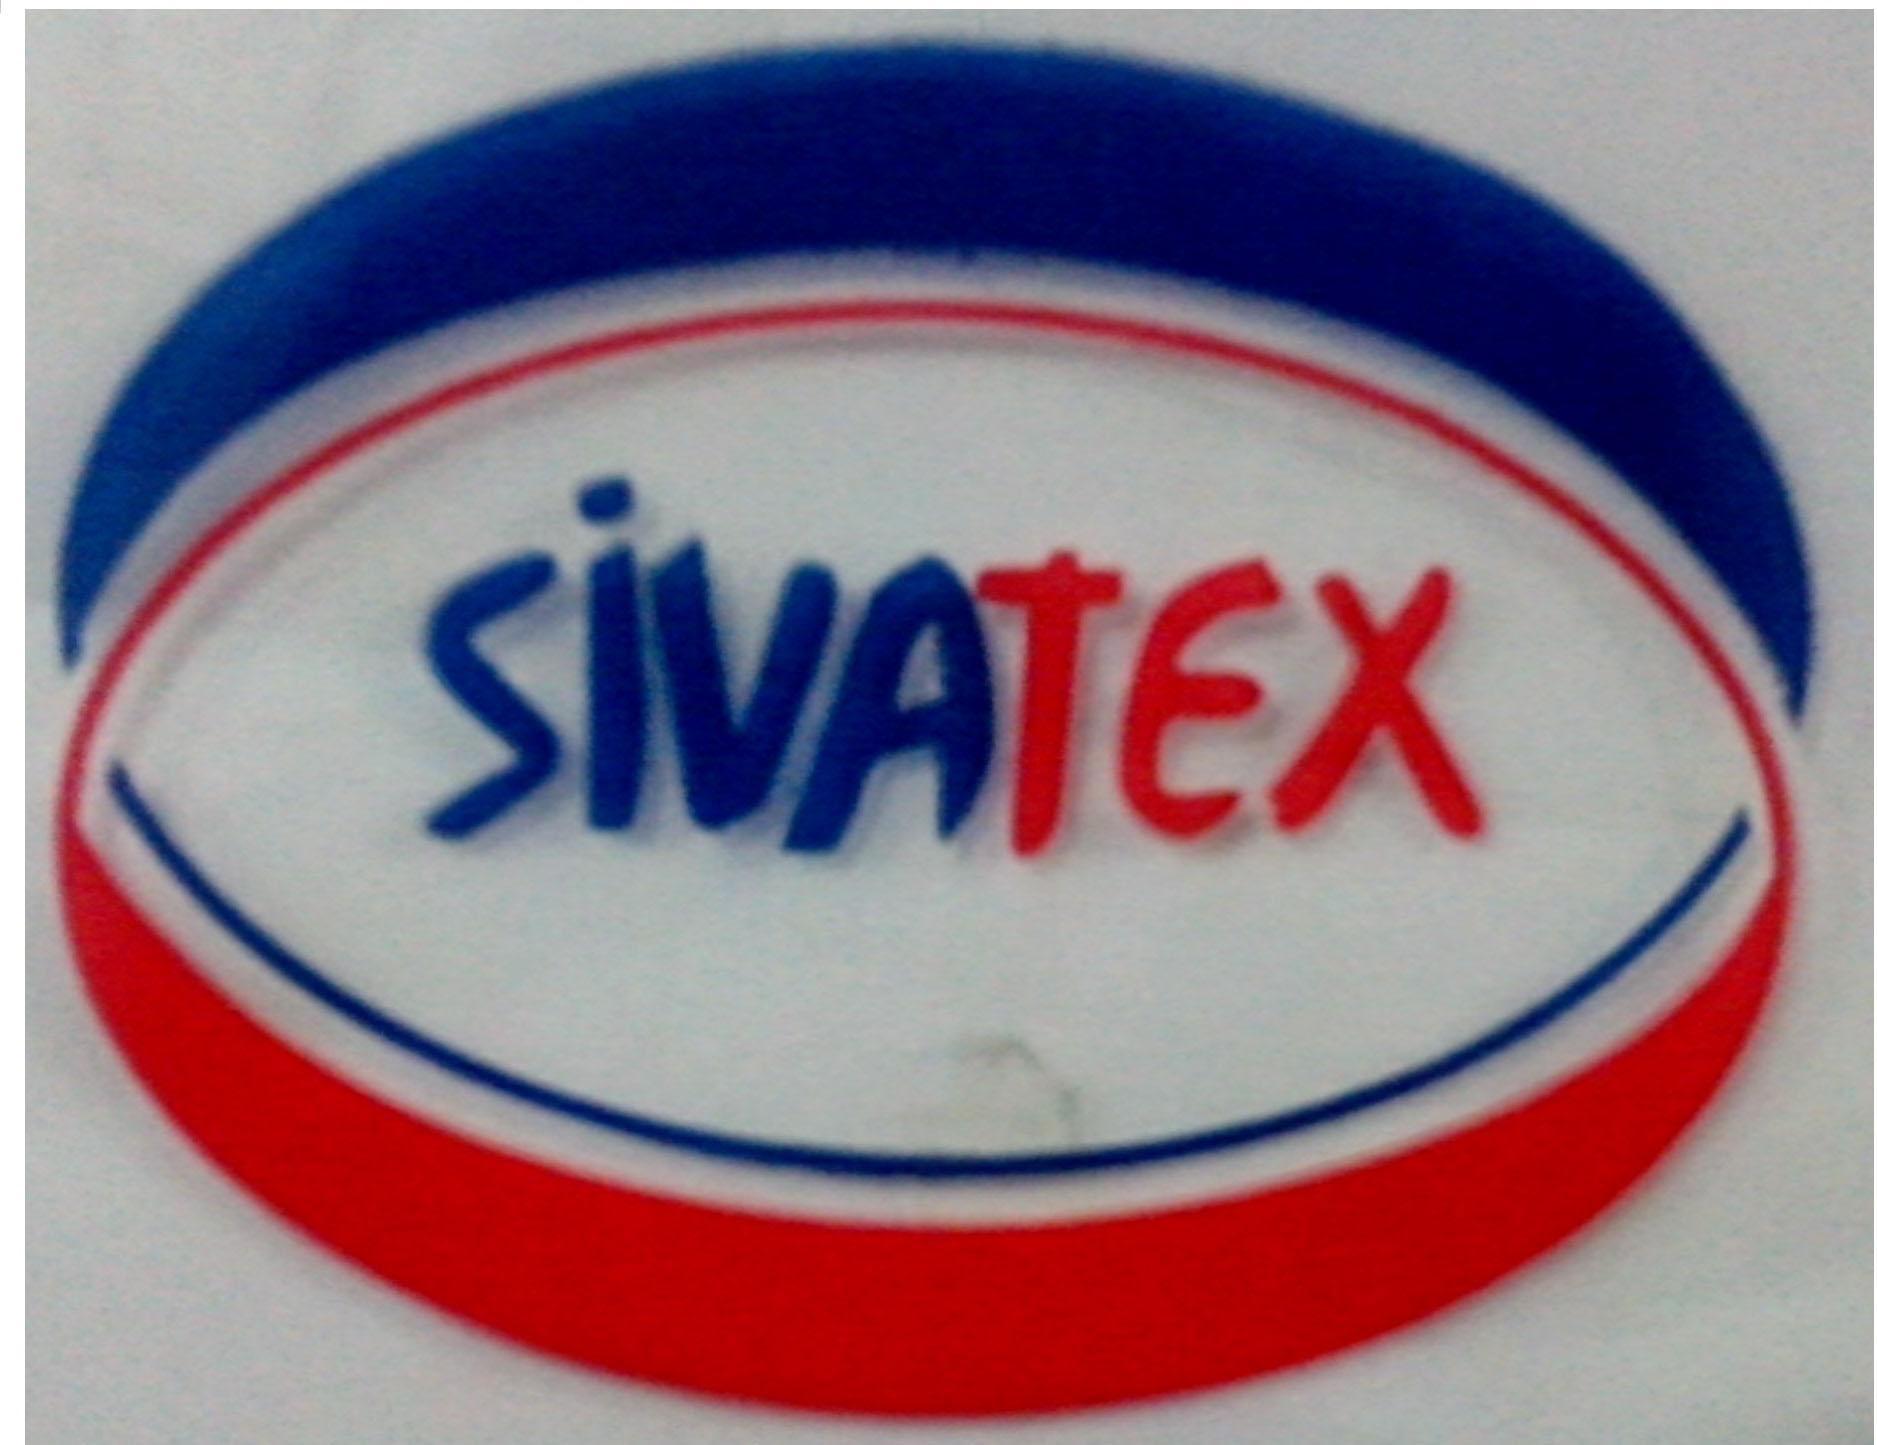 SivaTex Tesktil